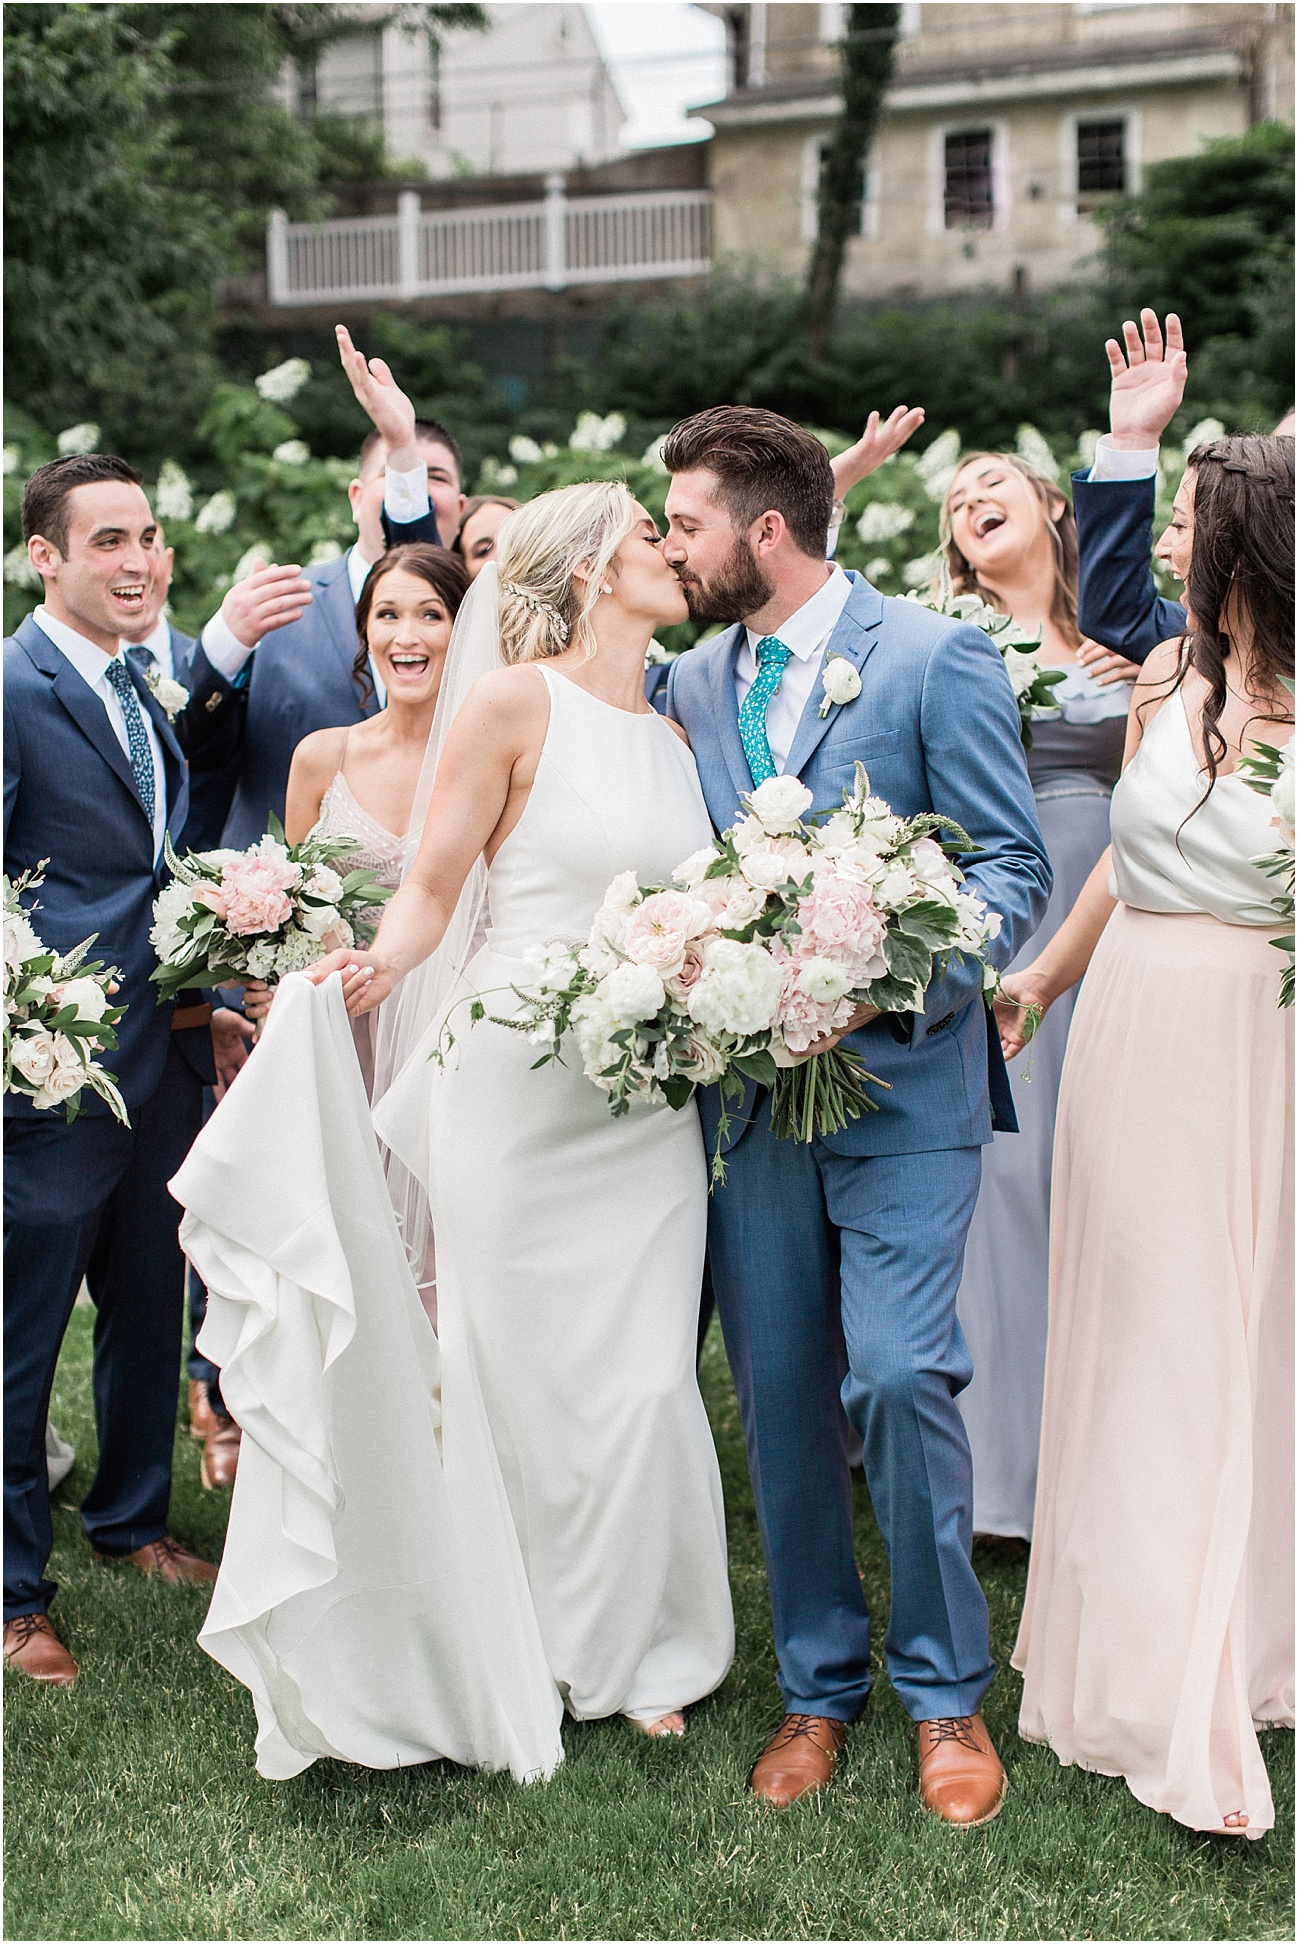 lindsey_paul_indian_pond_country_club_wild_dahlia_brewster_gardens_plymouth_cape_cod_boston_wedding_photographer_meredith_jane_photography_photo_0419.jpg